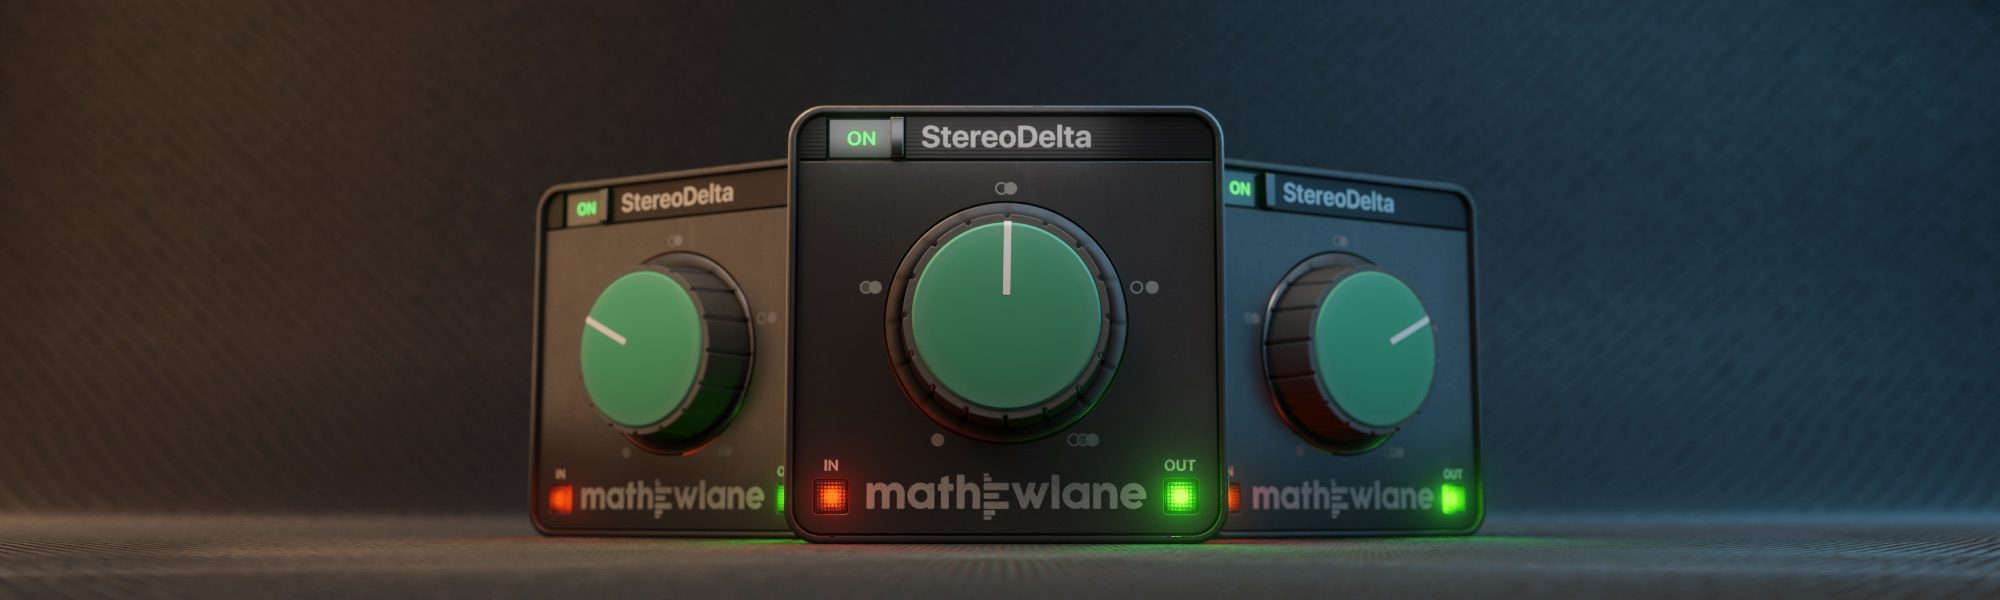 StereoDelta « Mathew Lane